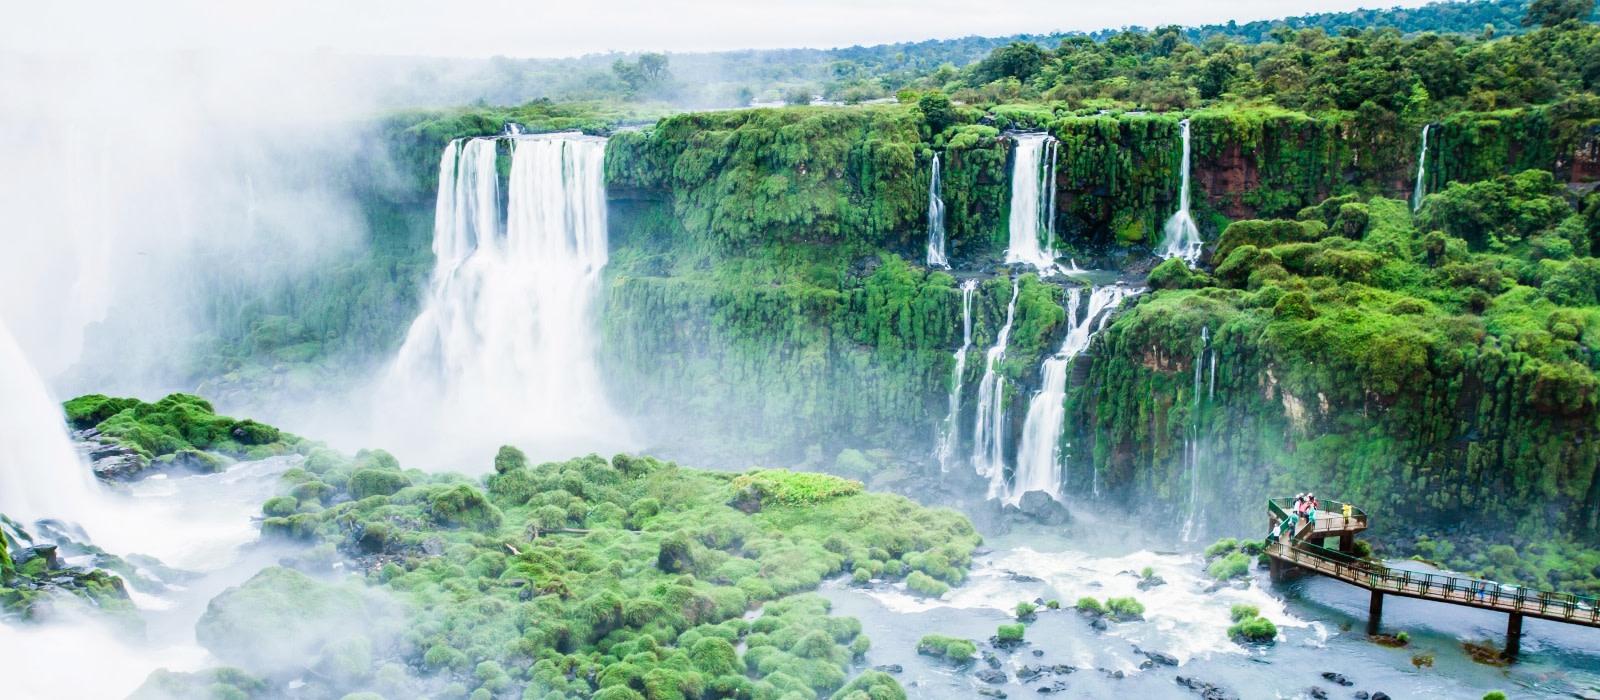 Brasilien Naturreise: Wasserfälle, Pantanal und Amazonas Urlaub 1